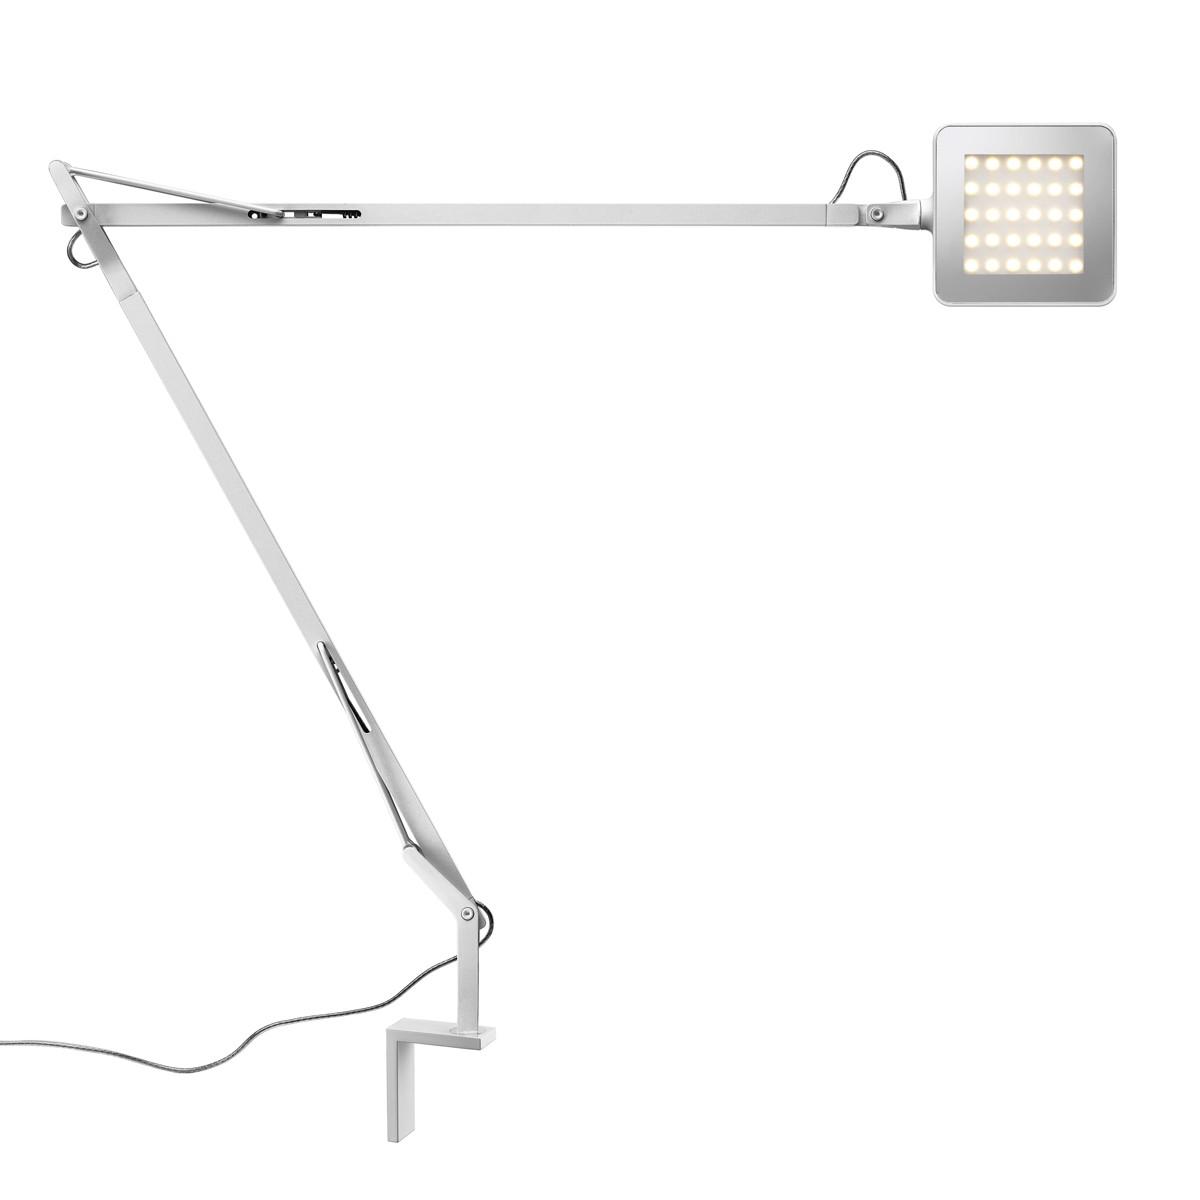 Flos Kelvin LED Wandleuchte, weiß glänzend